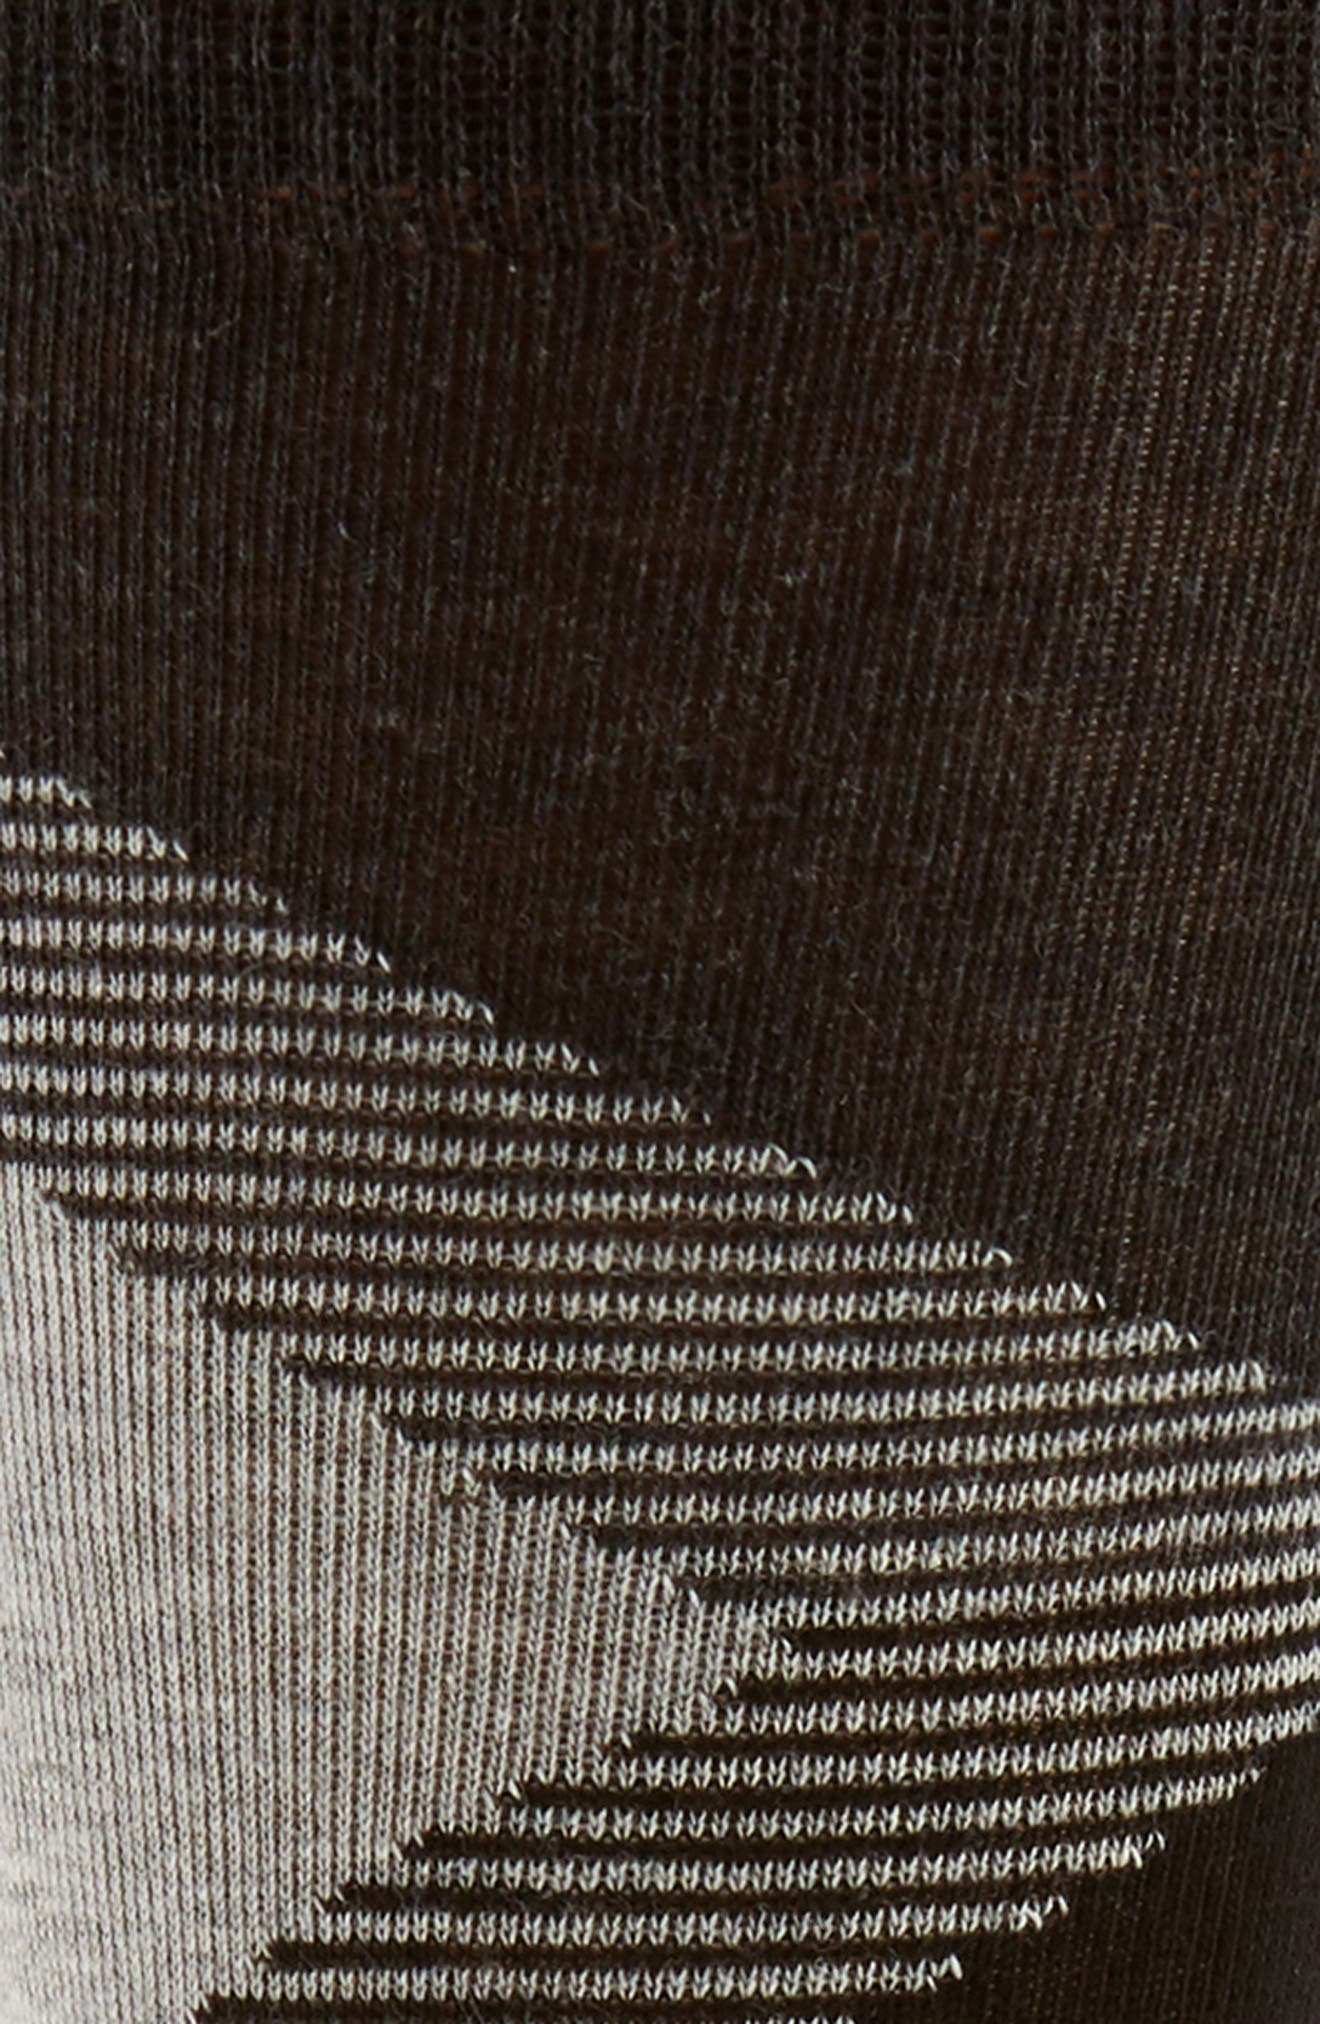 Big Diamond Socks,                             Alternate thumbnail 2, color,                             Black